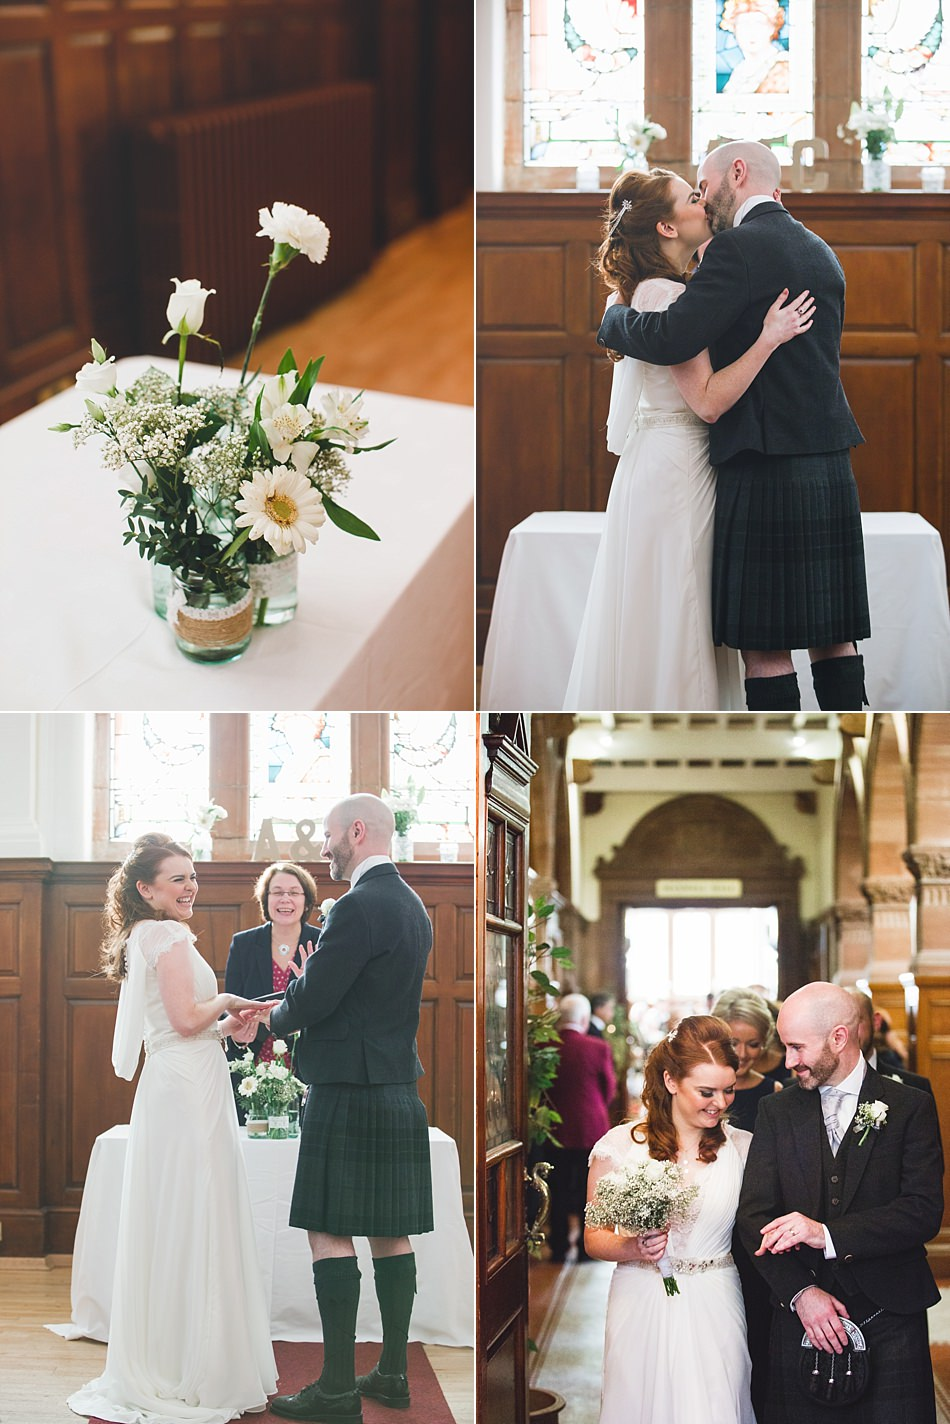 wedding pollokshields burgh halls glasgow 5-9.jpg